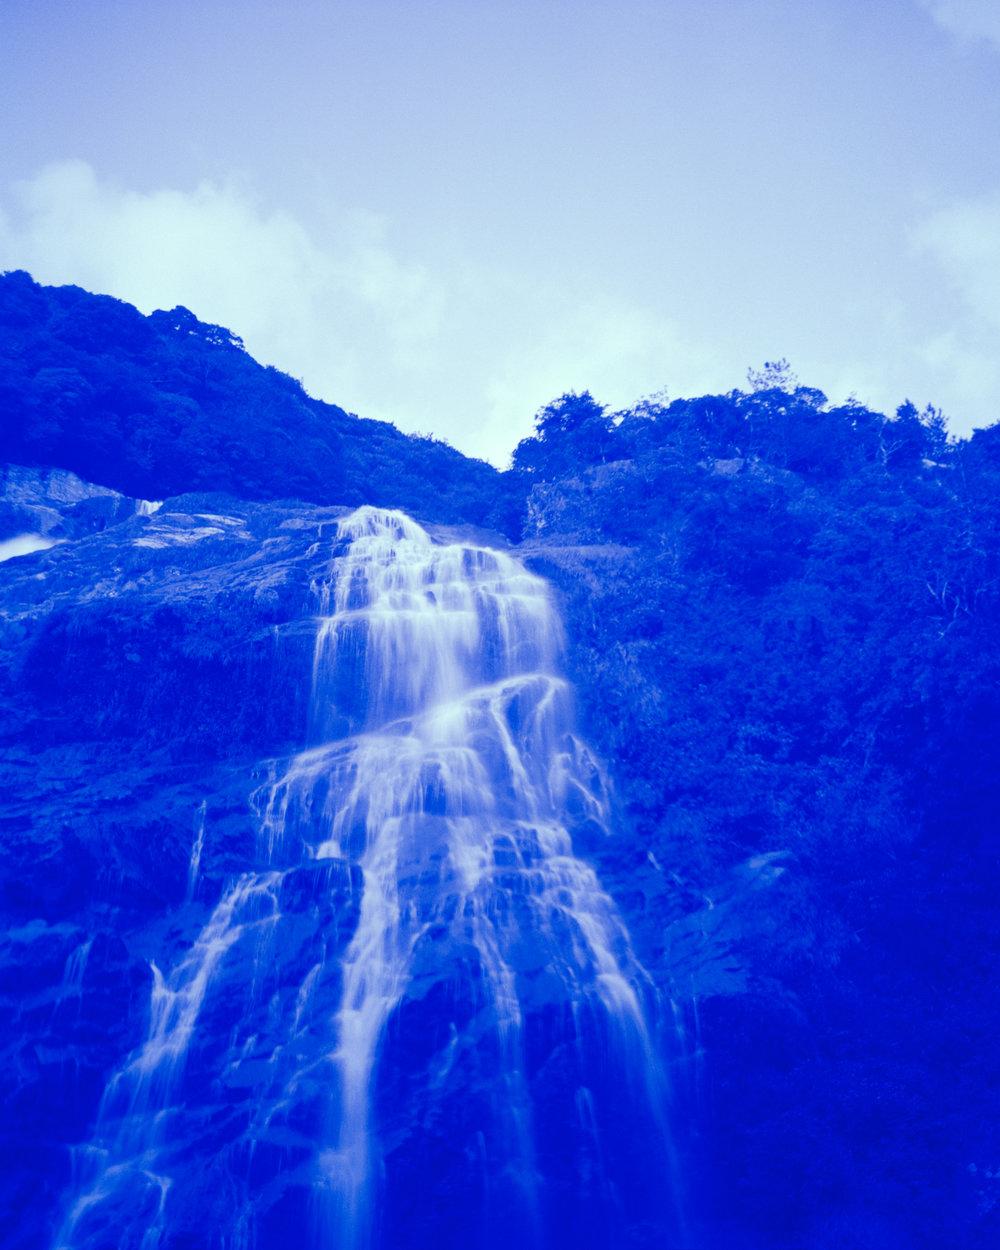 Waterfall I, 2017